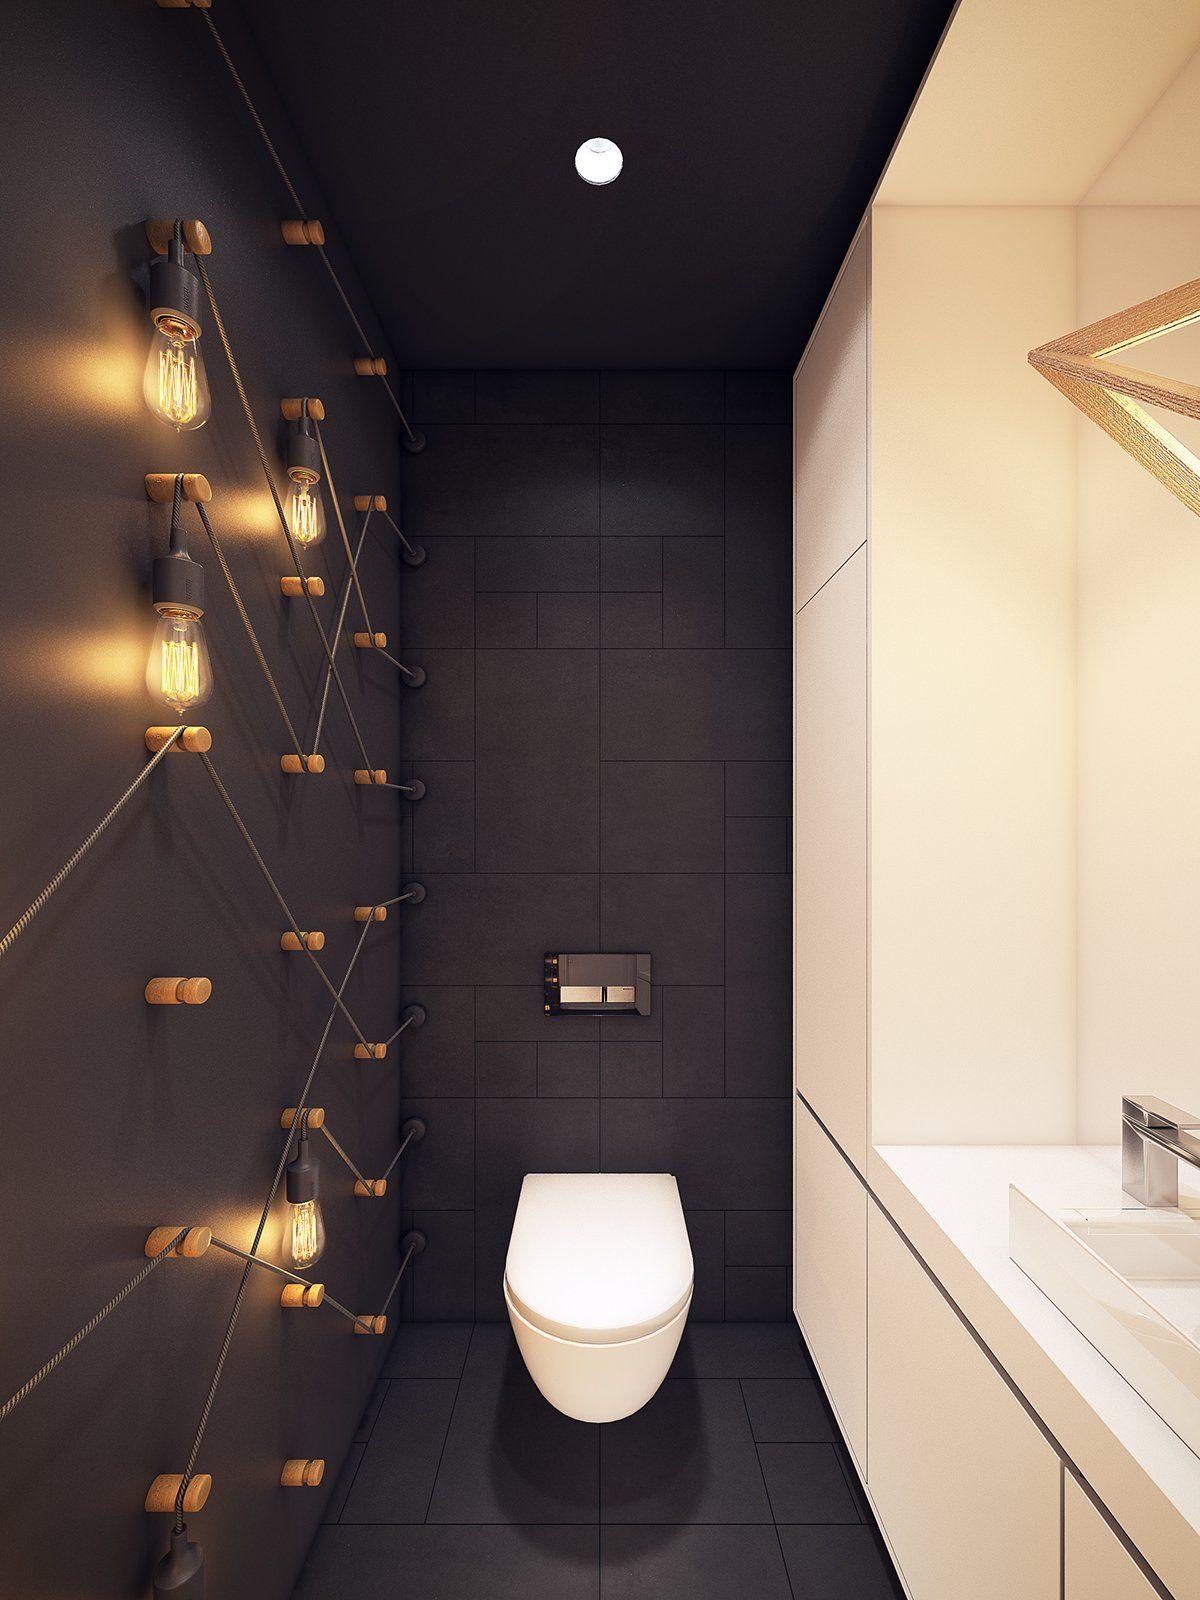 Moderne Zwei Zimmer Wohnung   Toilet, Guest toilet and Interiors